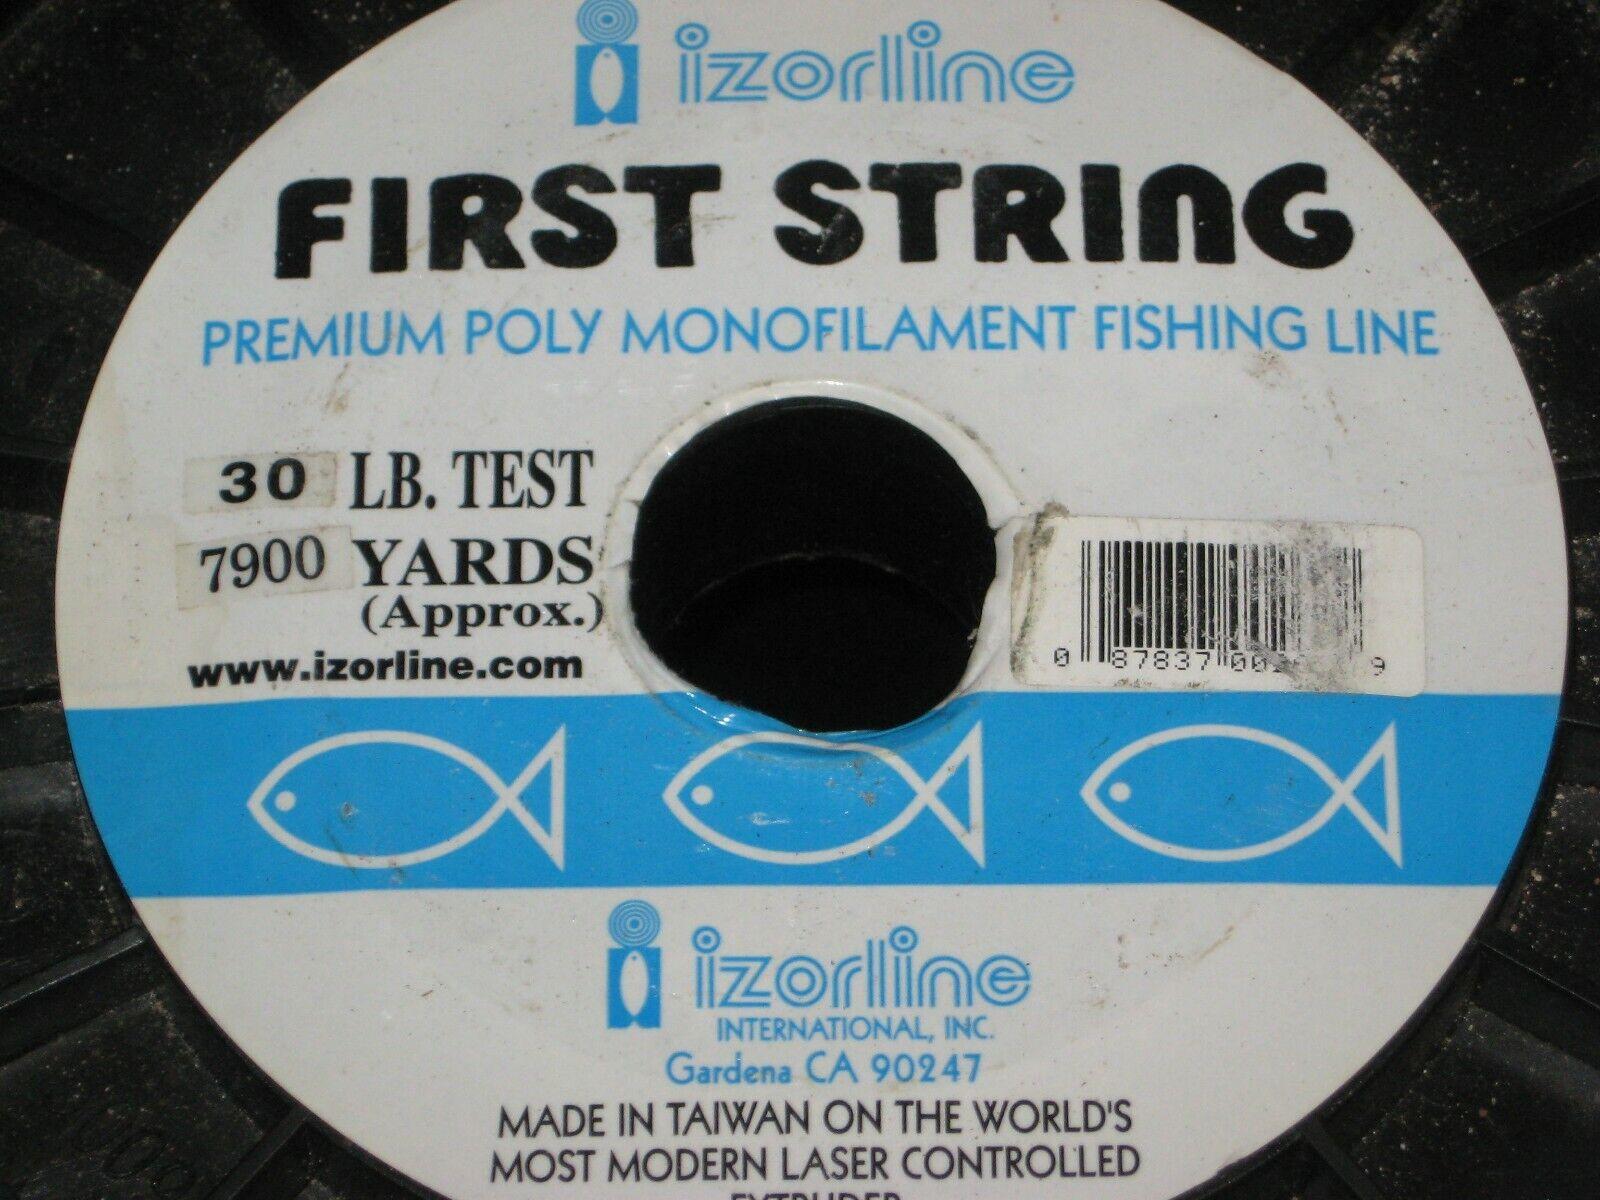 Izorline primero String Monofilauominit pesca Line 30 lb Test 7900 yds blu 2kg